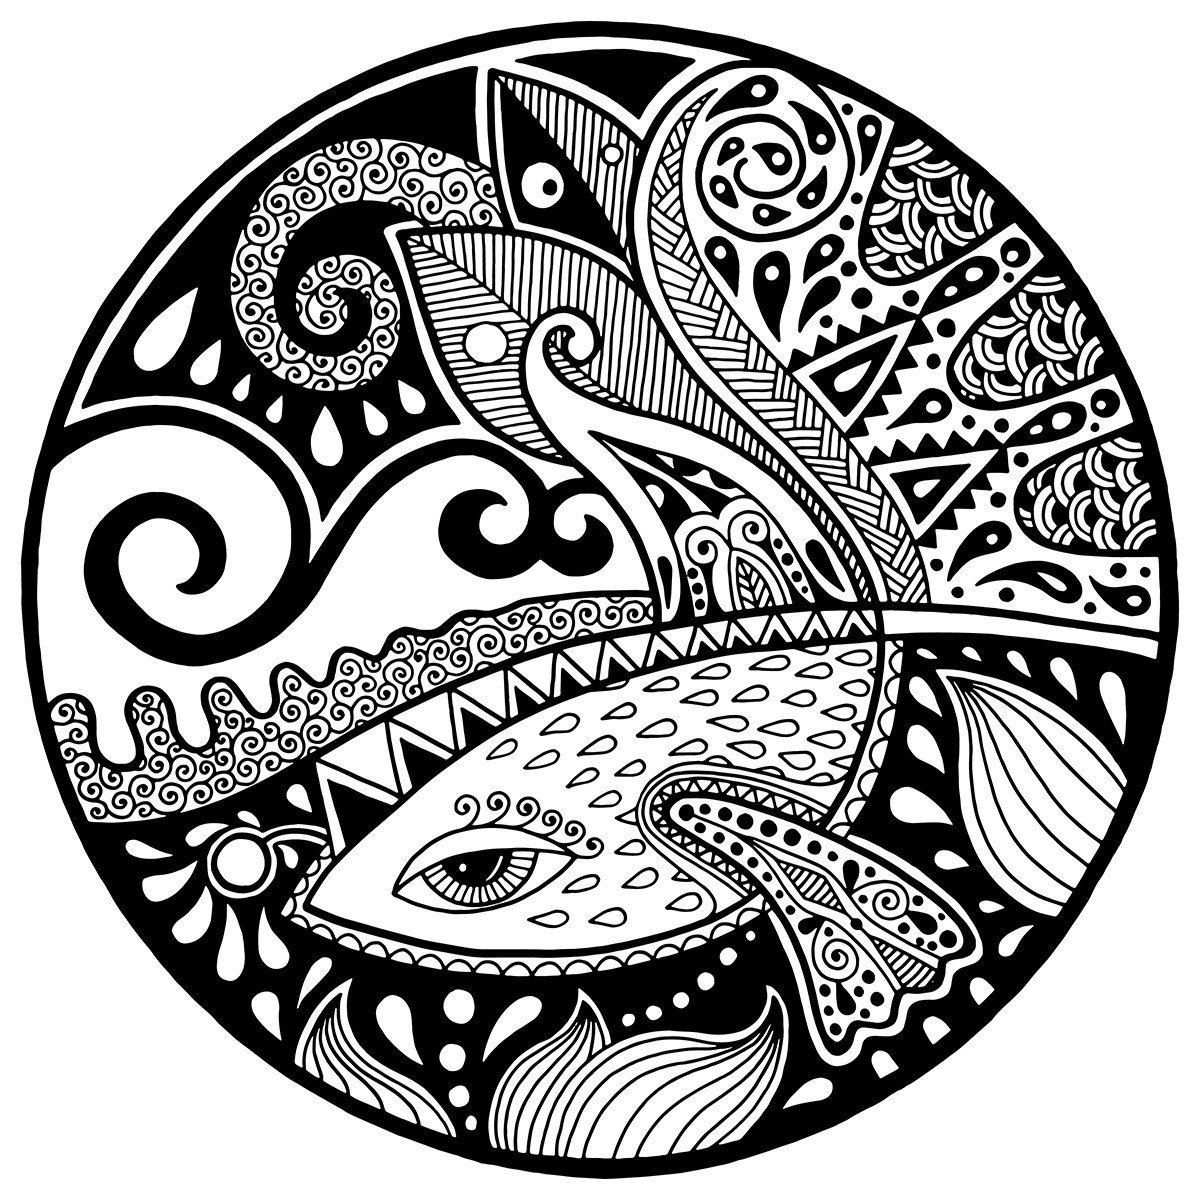 Зендала Русалка - Картинка для раскрашивания красками-гуашью